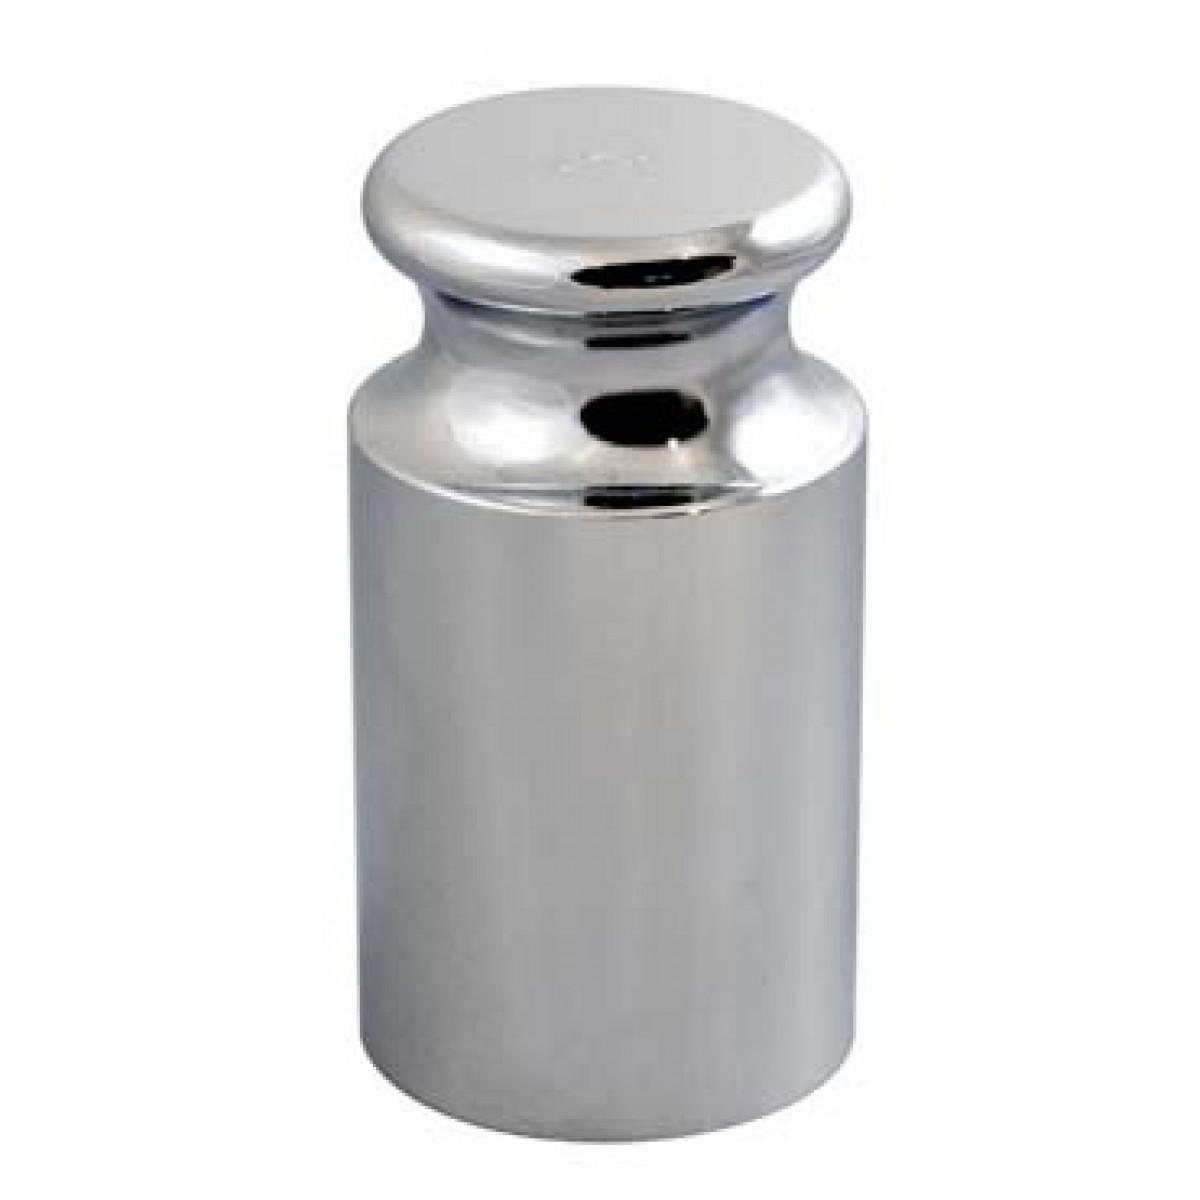 Kalibreringslod - Kapacitet 100 gr.  Standard